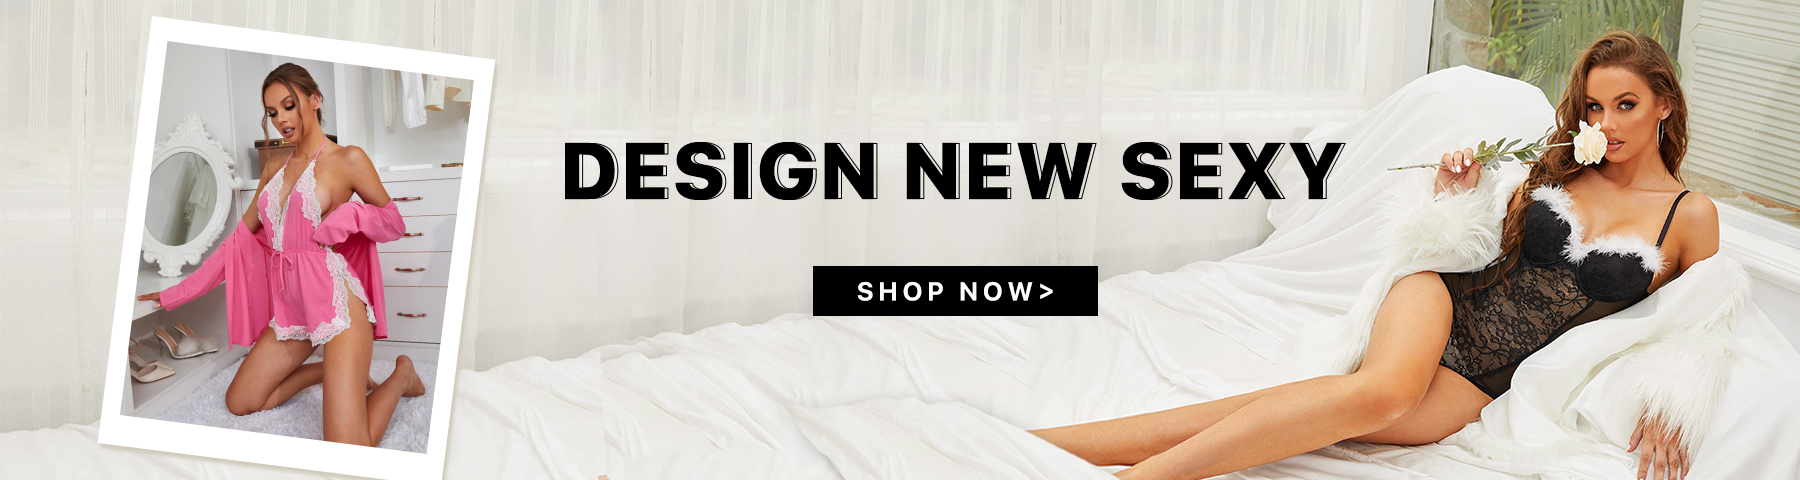 design new sexy